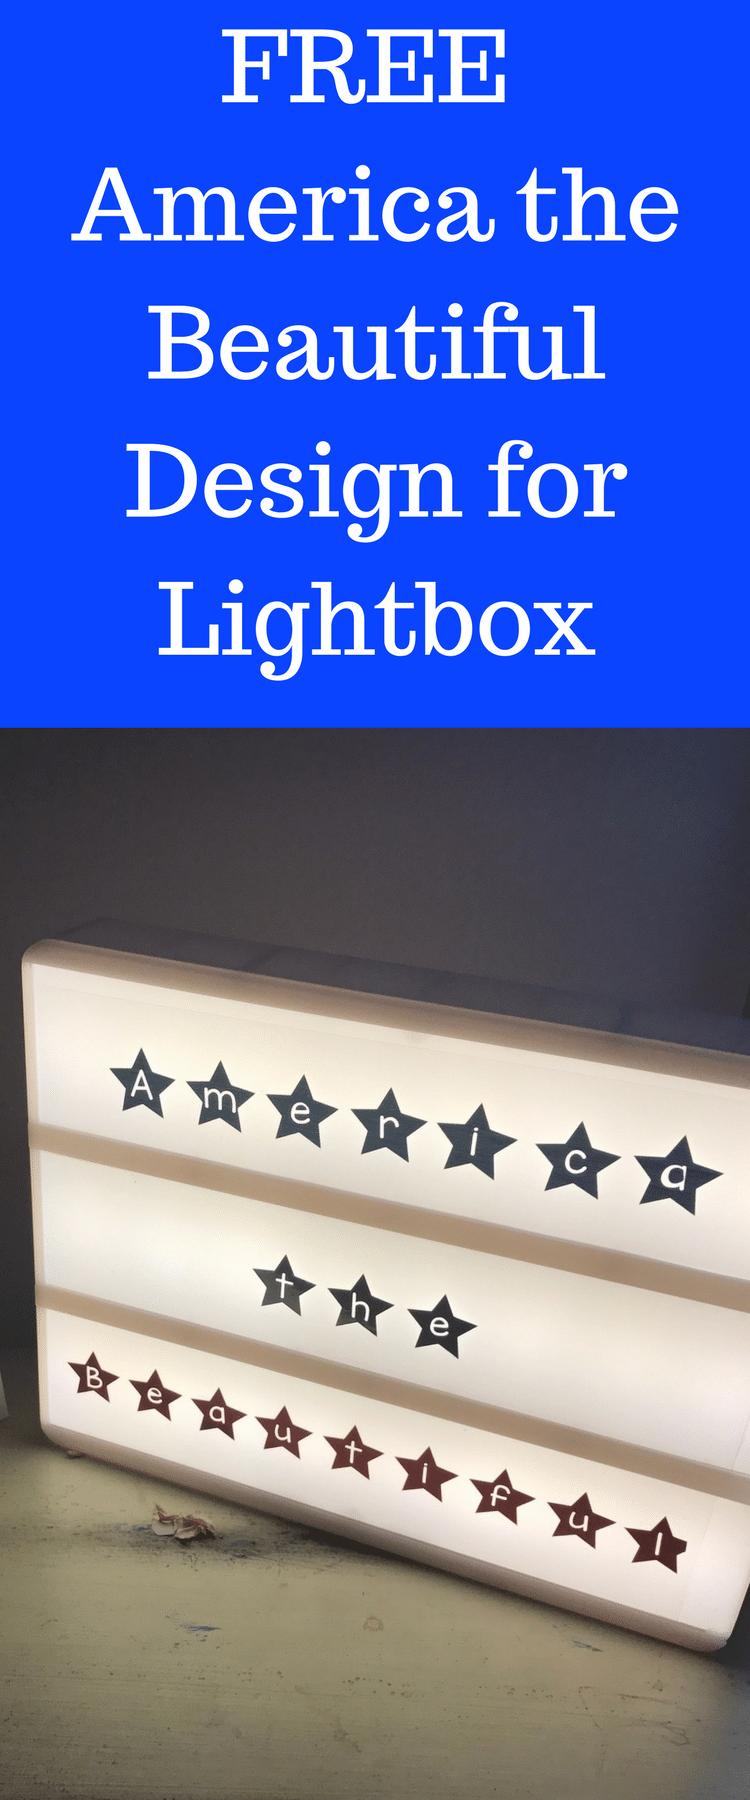 Cricut Tutorial / Cricut Craft Ideas / Cricut Fourth of July / Lightbox Tutorial / DIY LIghtbox insert / Cricut Explore Air / Free Cricut Files via @clarkscondensed